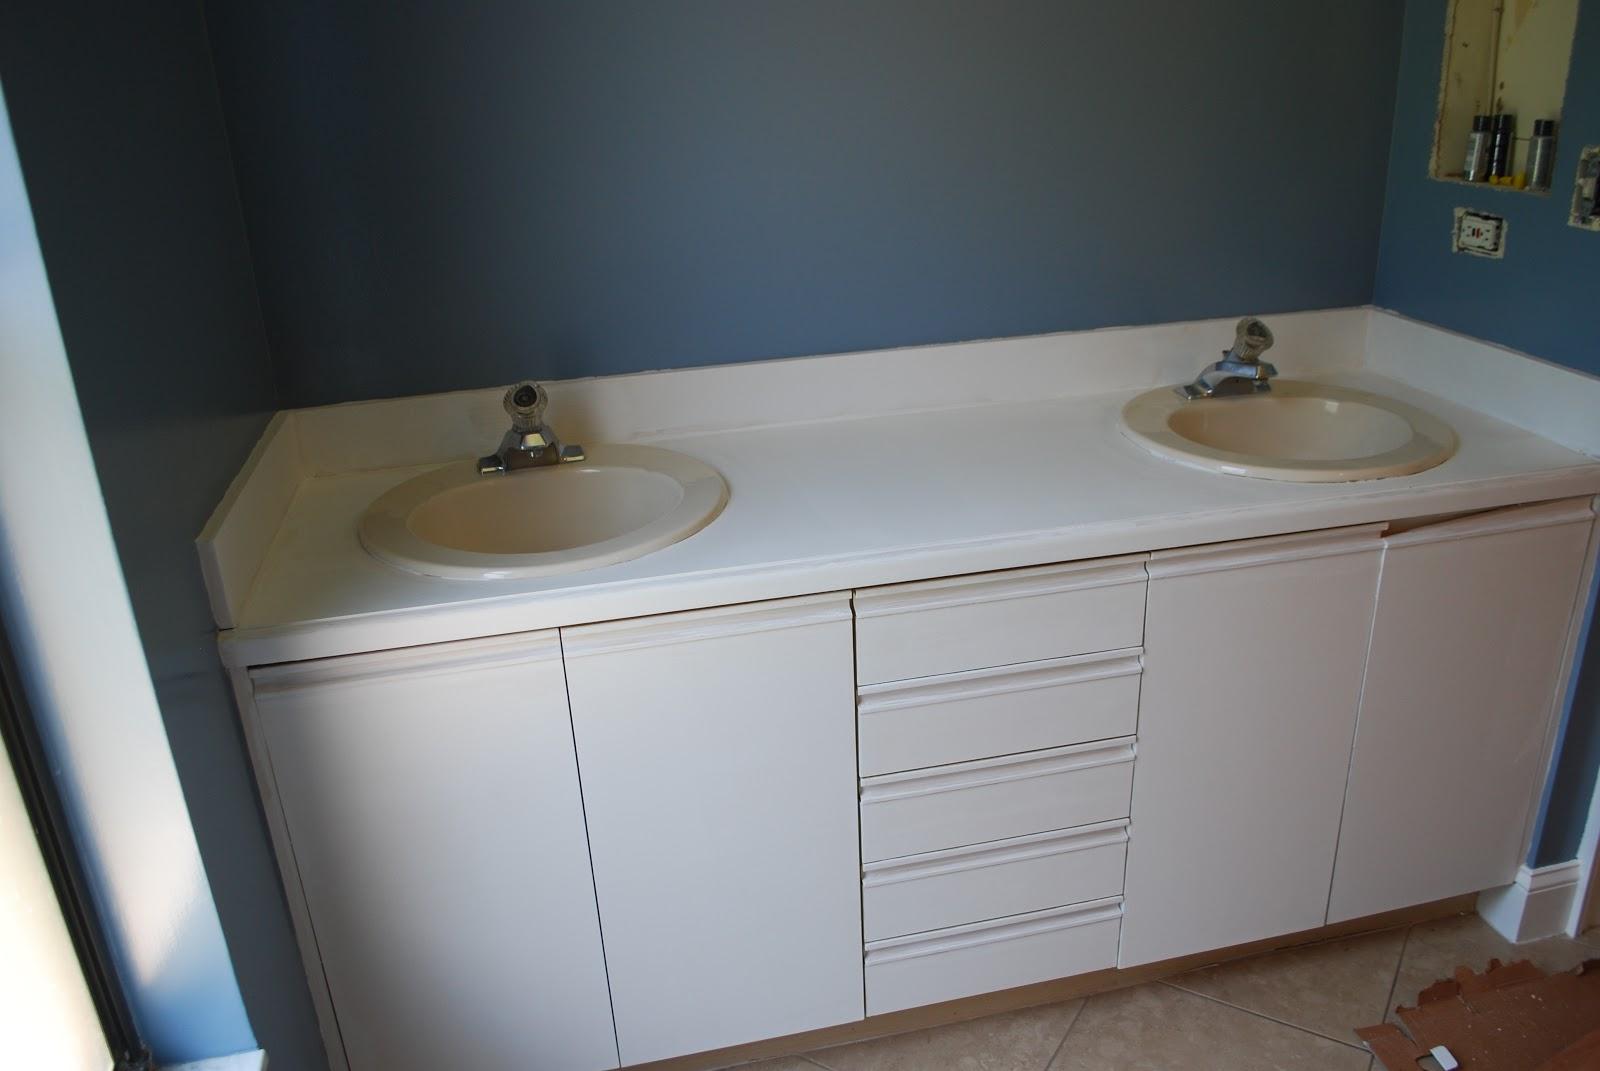 Tutorial How To Paint Bathroom Countertops Look Like Faux Granite